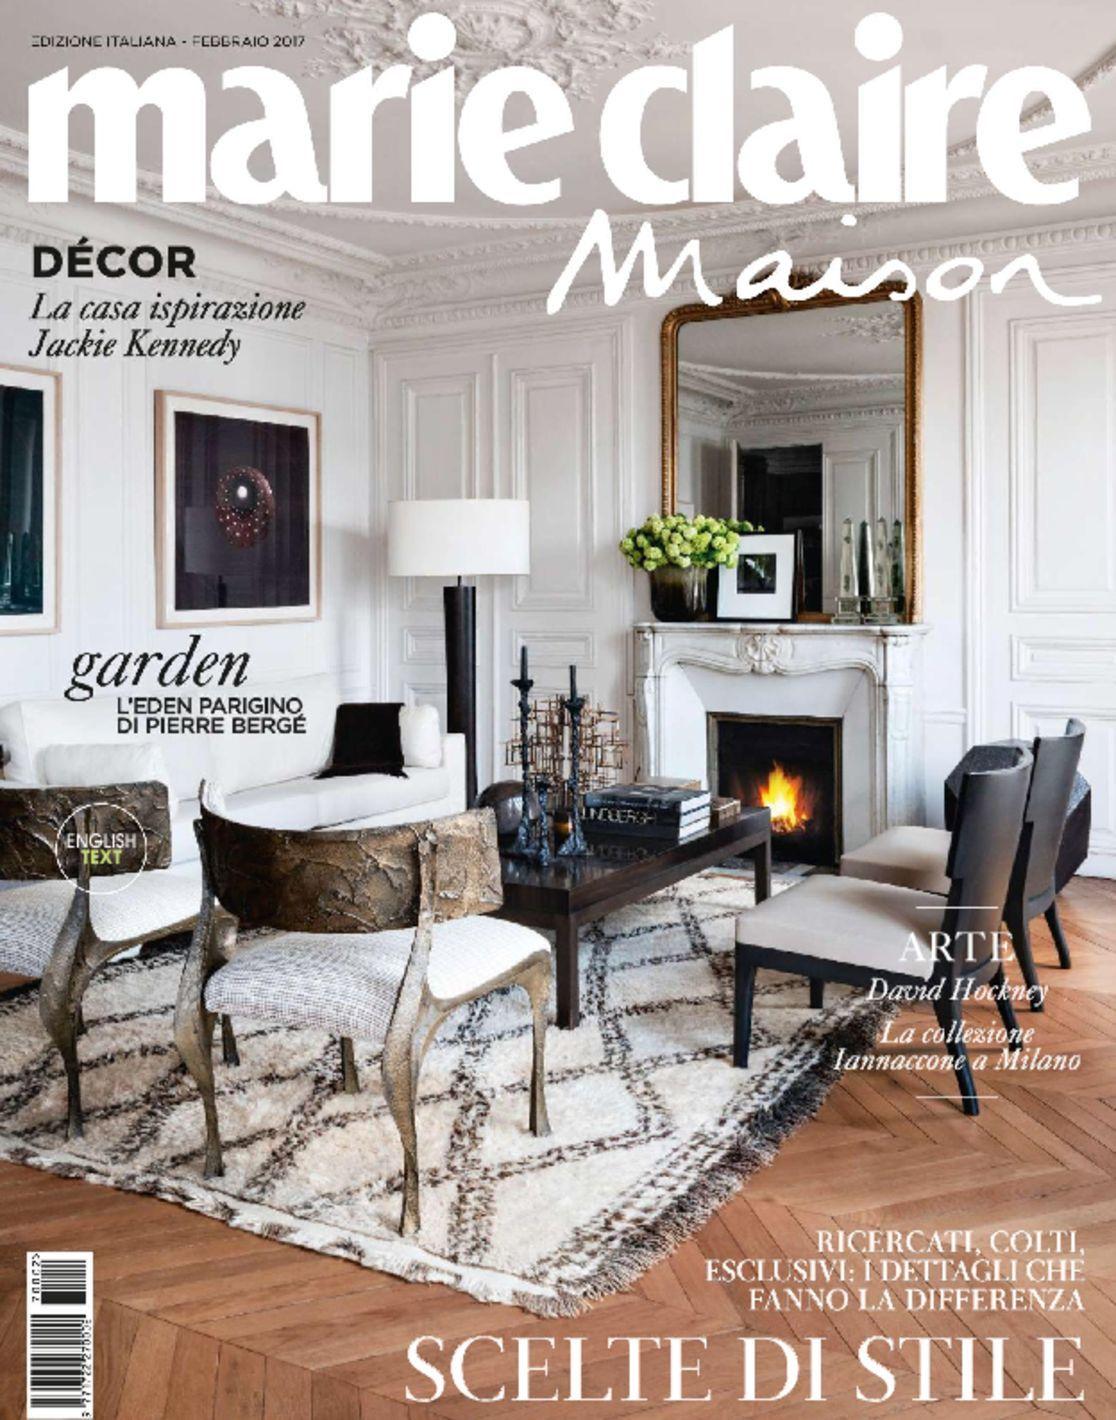 marie claire maison italia digital magazine. Black Bedroom Furniture Sets. Home Design Ideas